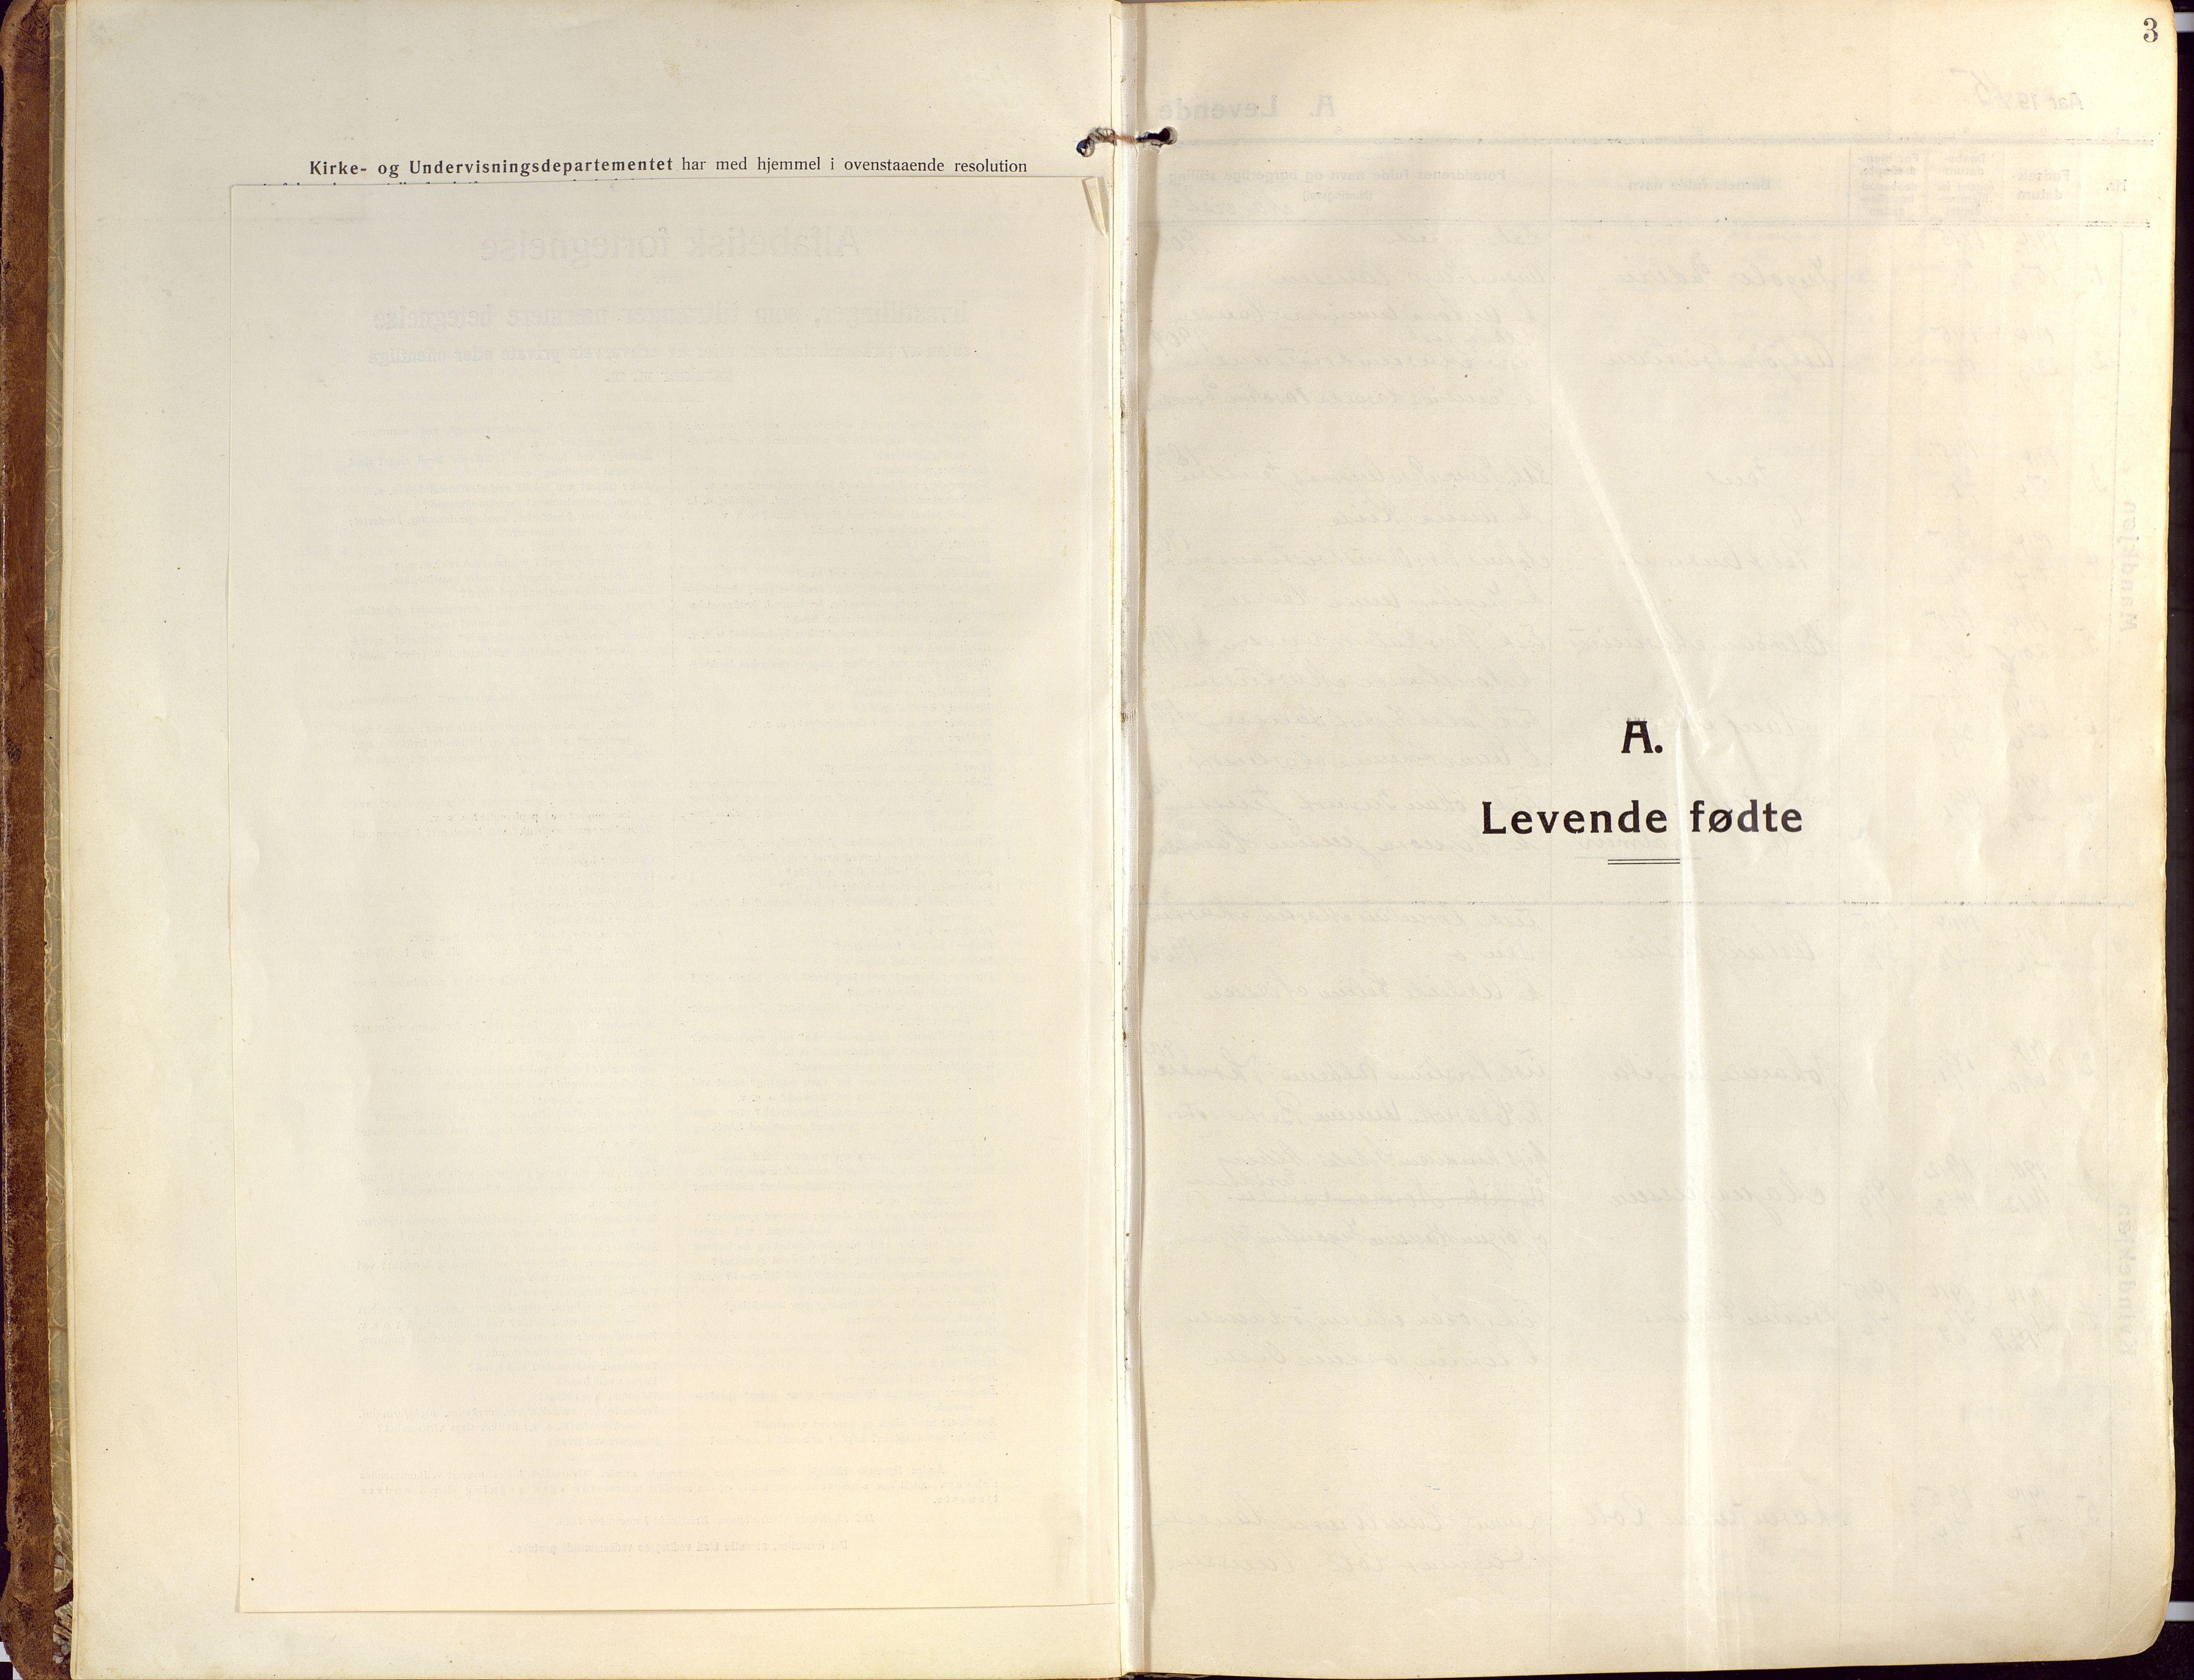 SATØ, Ibestad sokneprestembete, Ministerialbok nr. 18, 1915-1929, s. 3